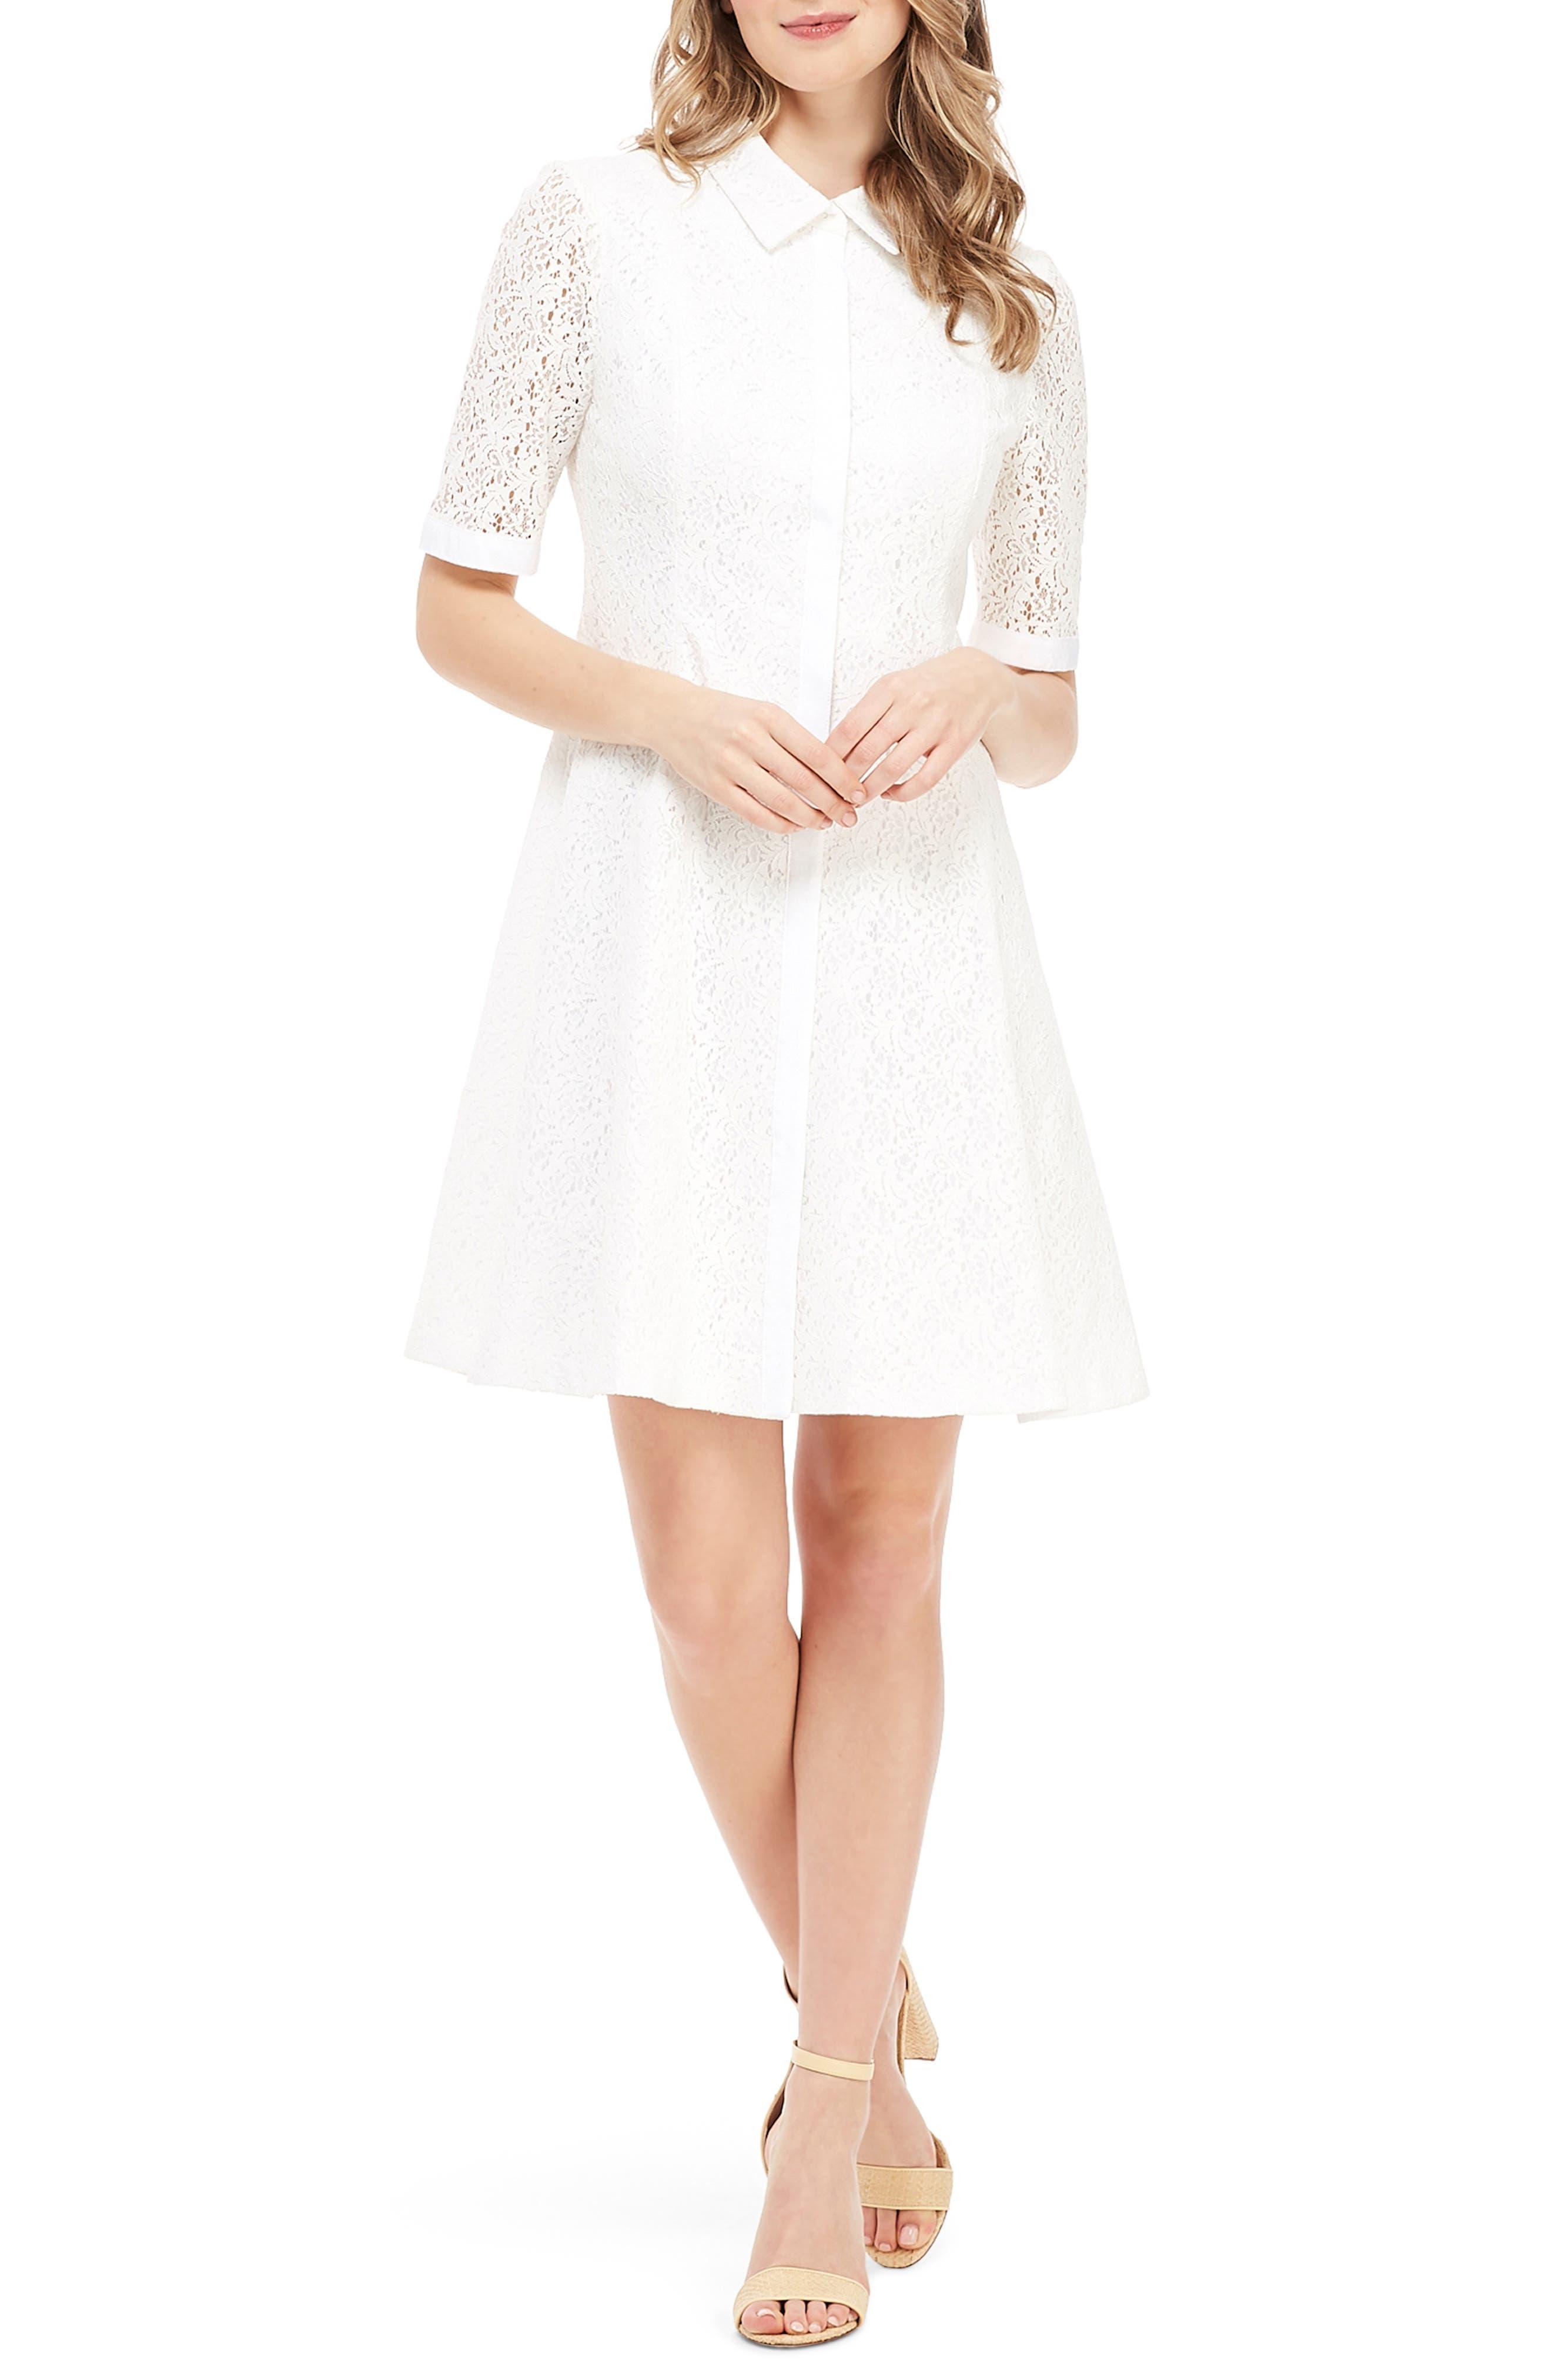 1960s Dresses | 60s Dresses Mod, Mini, Jackie O, Hippie Womens Gal Meets Glam Collection Button Front A-Line Lace Dress $210.00 AT vintagedancer.com